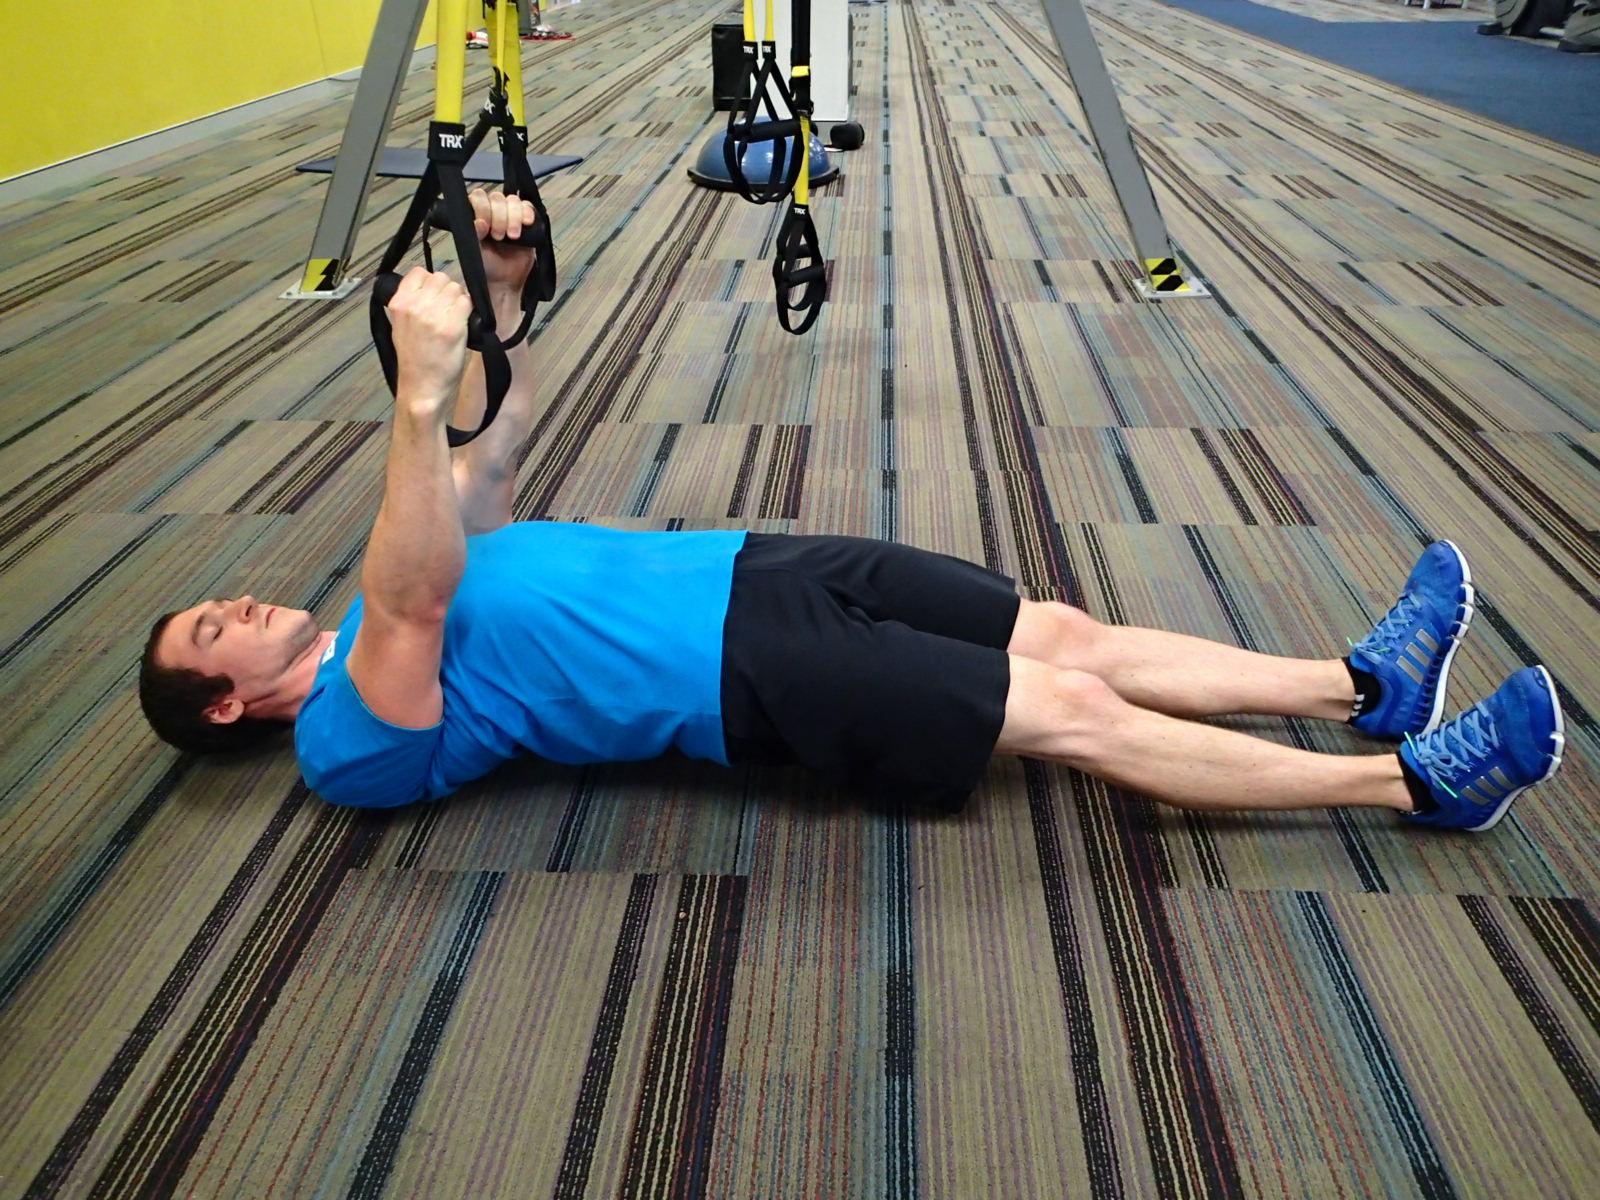 Inverted Row (Suspension Trainer) - legs straight